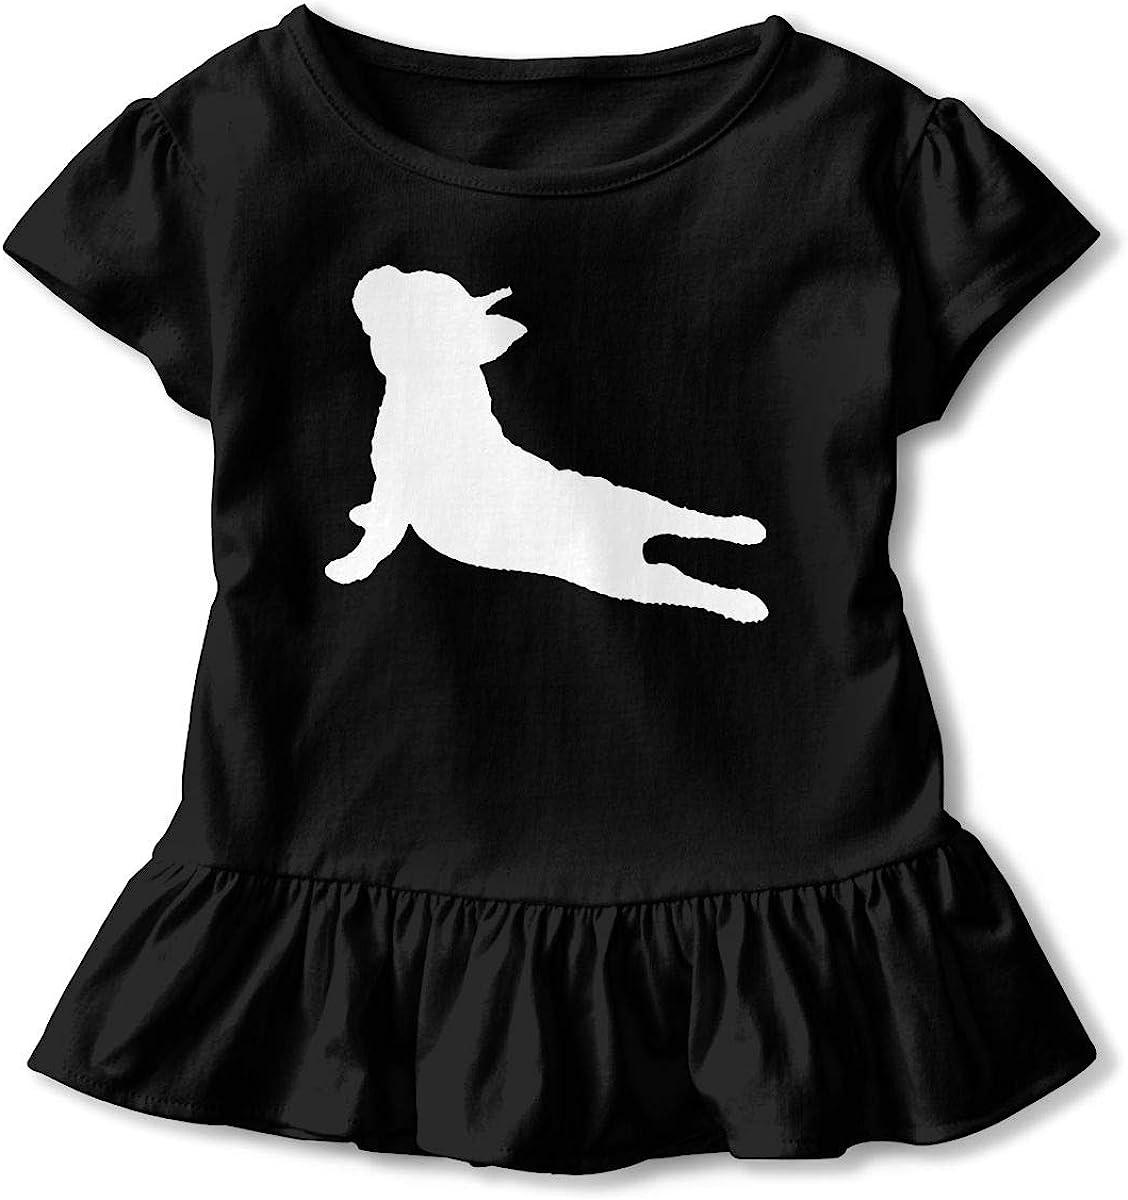 Zi7J9q-0 Short-Sleeve French Bulldog Yoga T-Shirts for Girls Ruffled Blouse Clothes with Falbala 2-6T